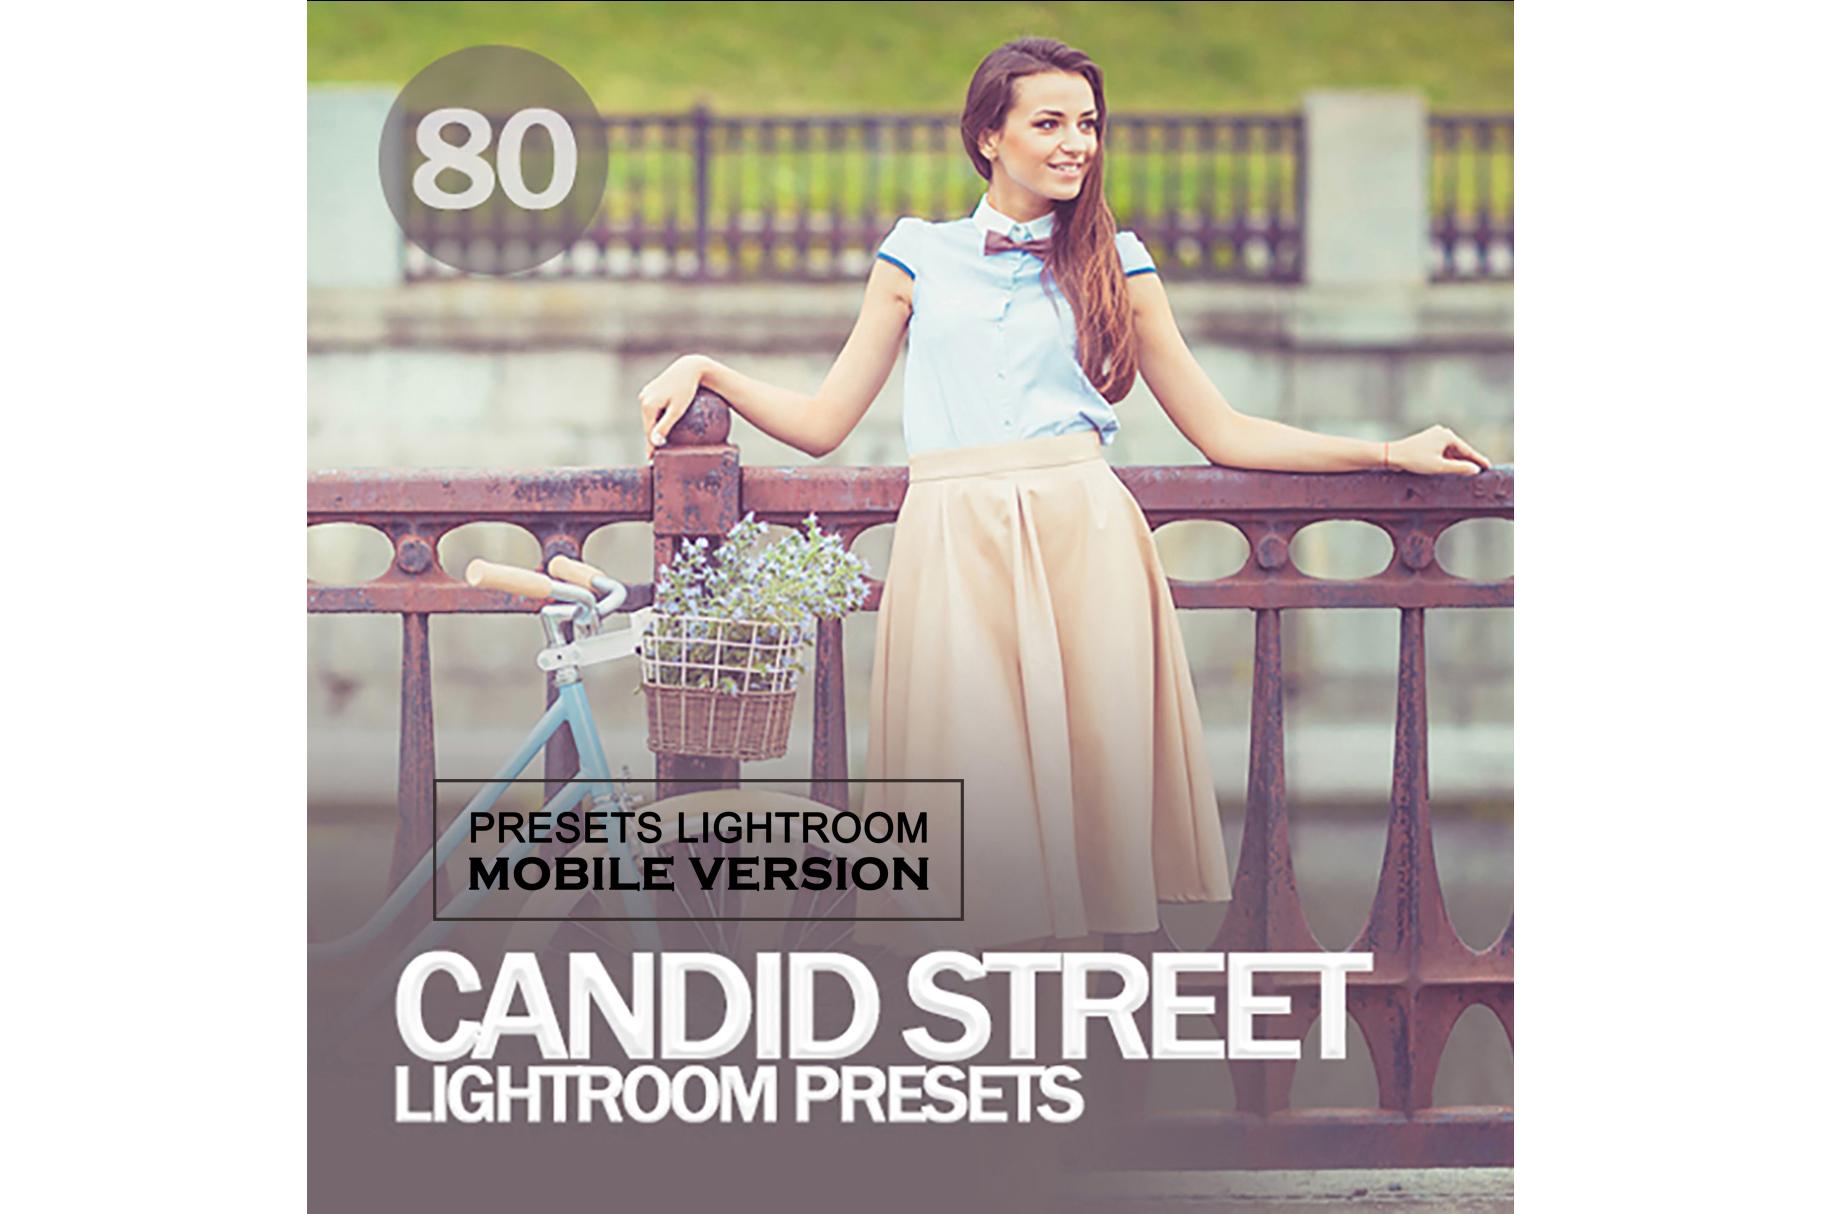 Candid Street Lightroom Mobile Presets example image 1